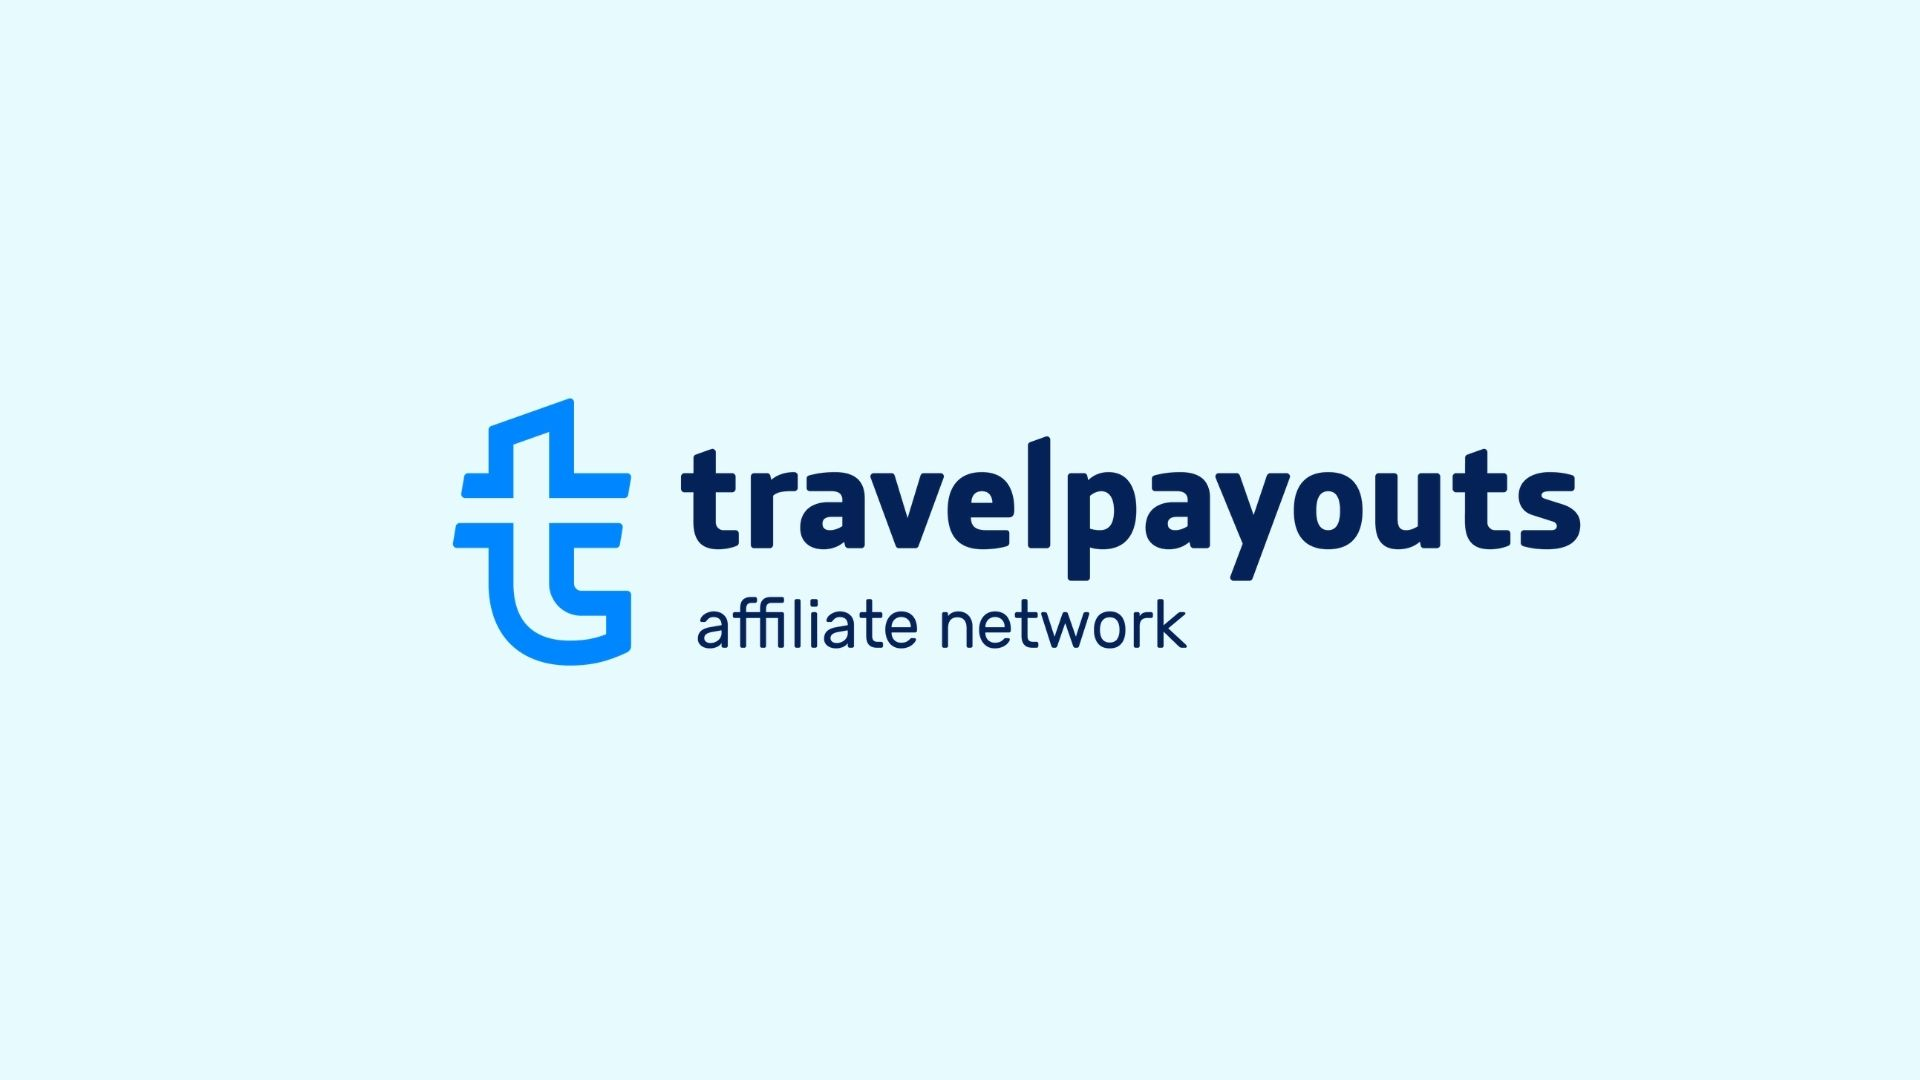 TravelPayouts